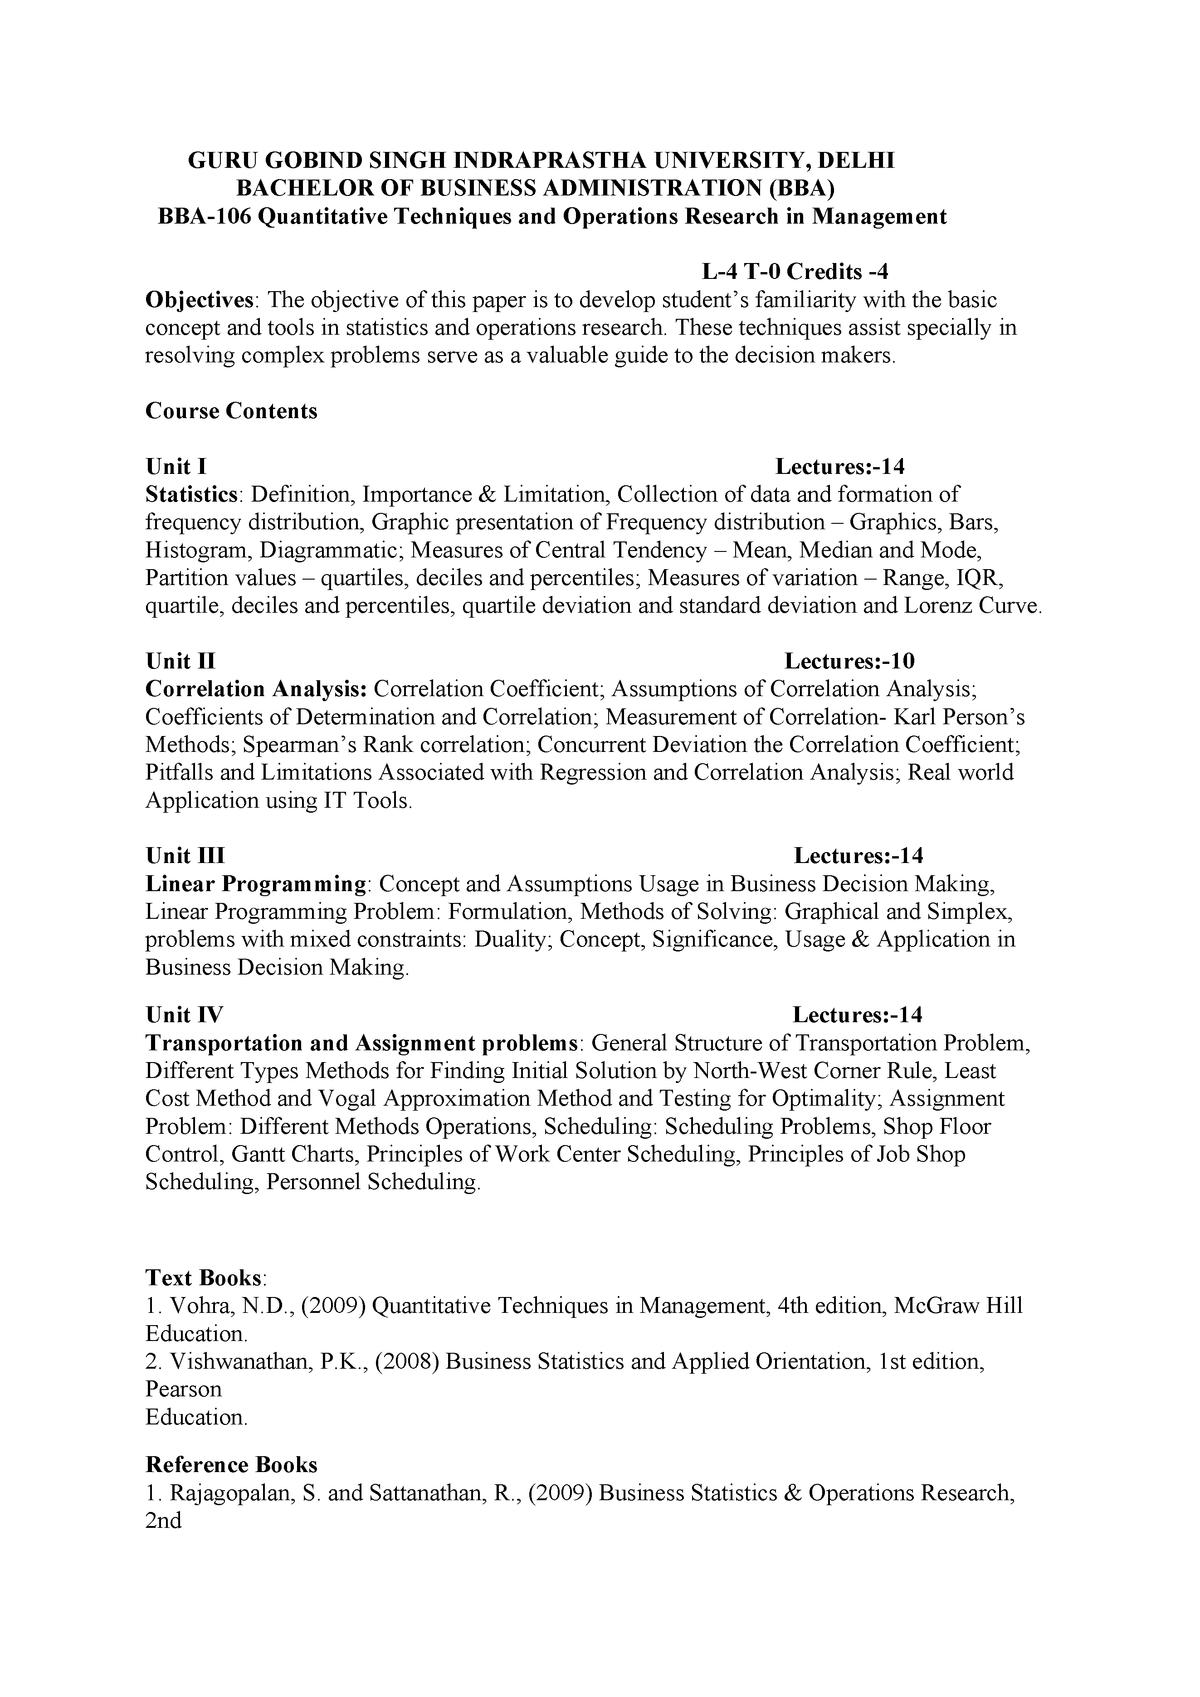 QTOR Syllabus - BBA NOTES - BBA: Bachelors of Business